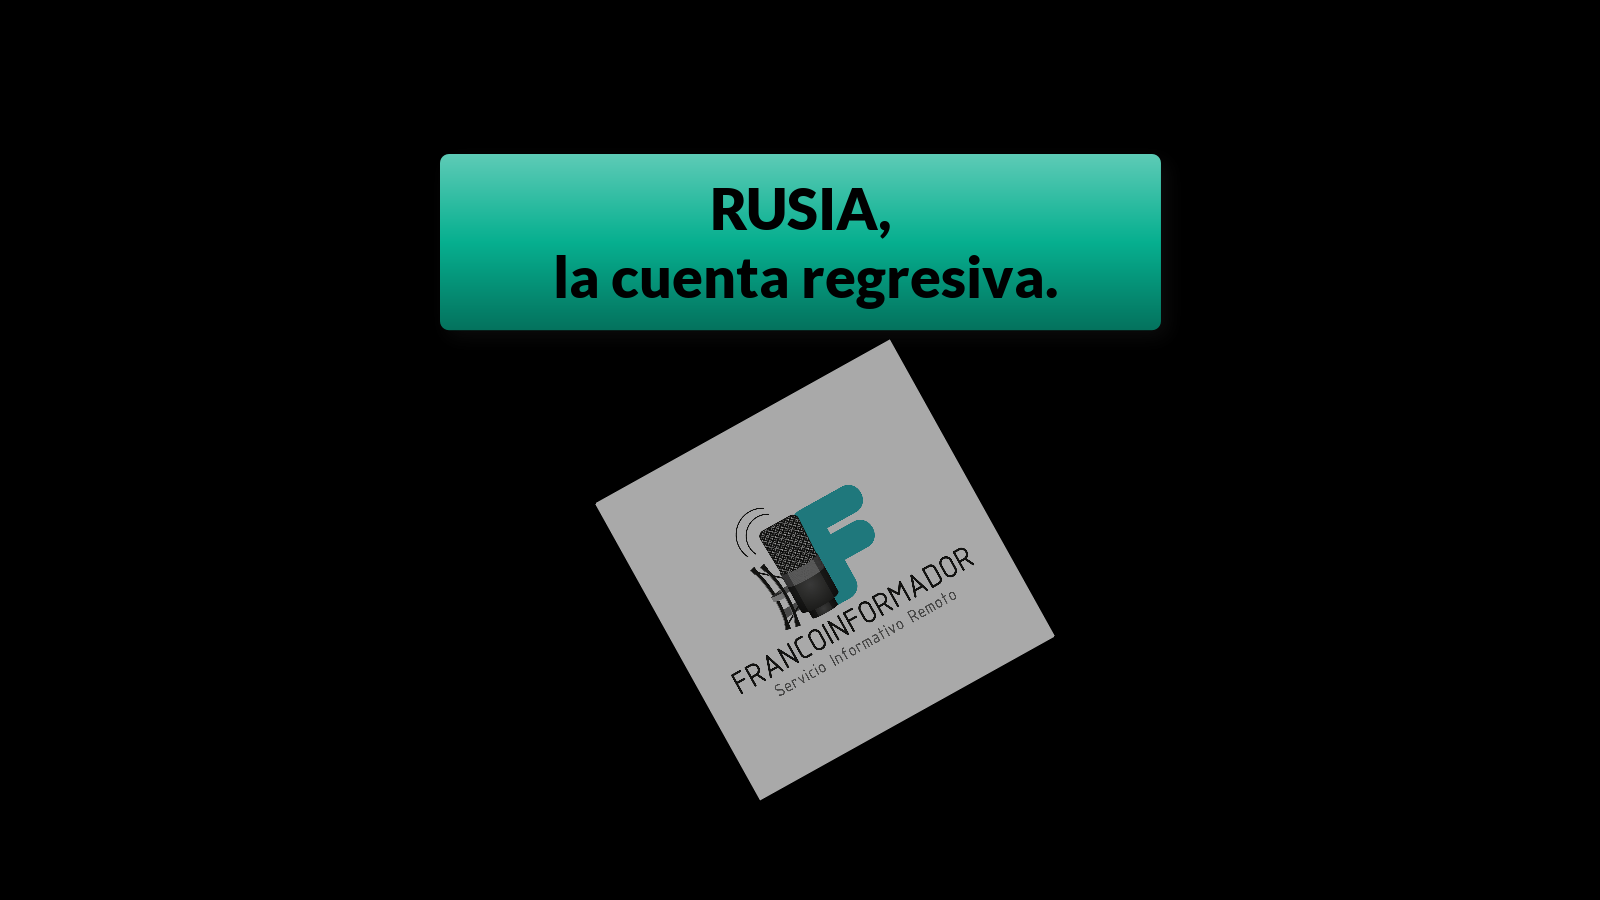 Rusia cuenta regresiva youtube First Frame.png e23e7fb6a65